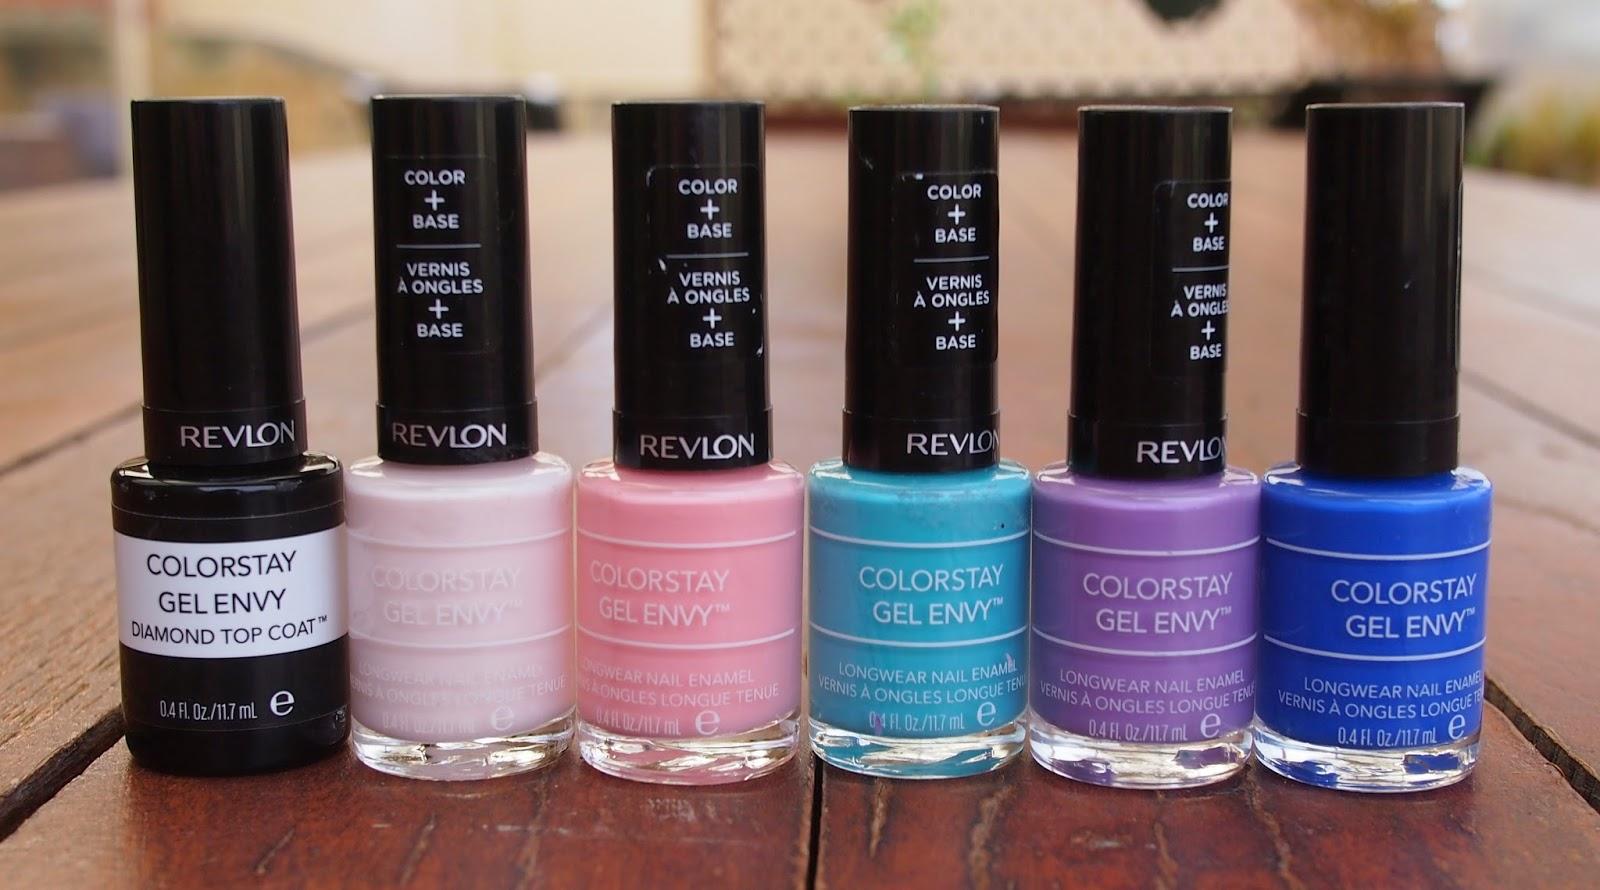 Revlon Gel Envy Longwear Nail Enamel Review and Swatches